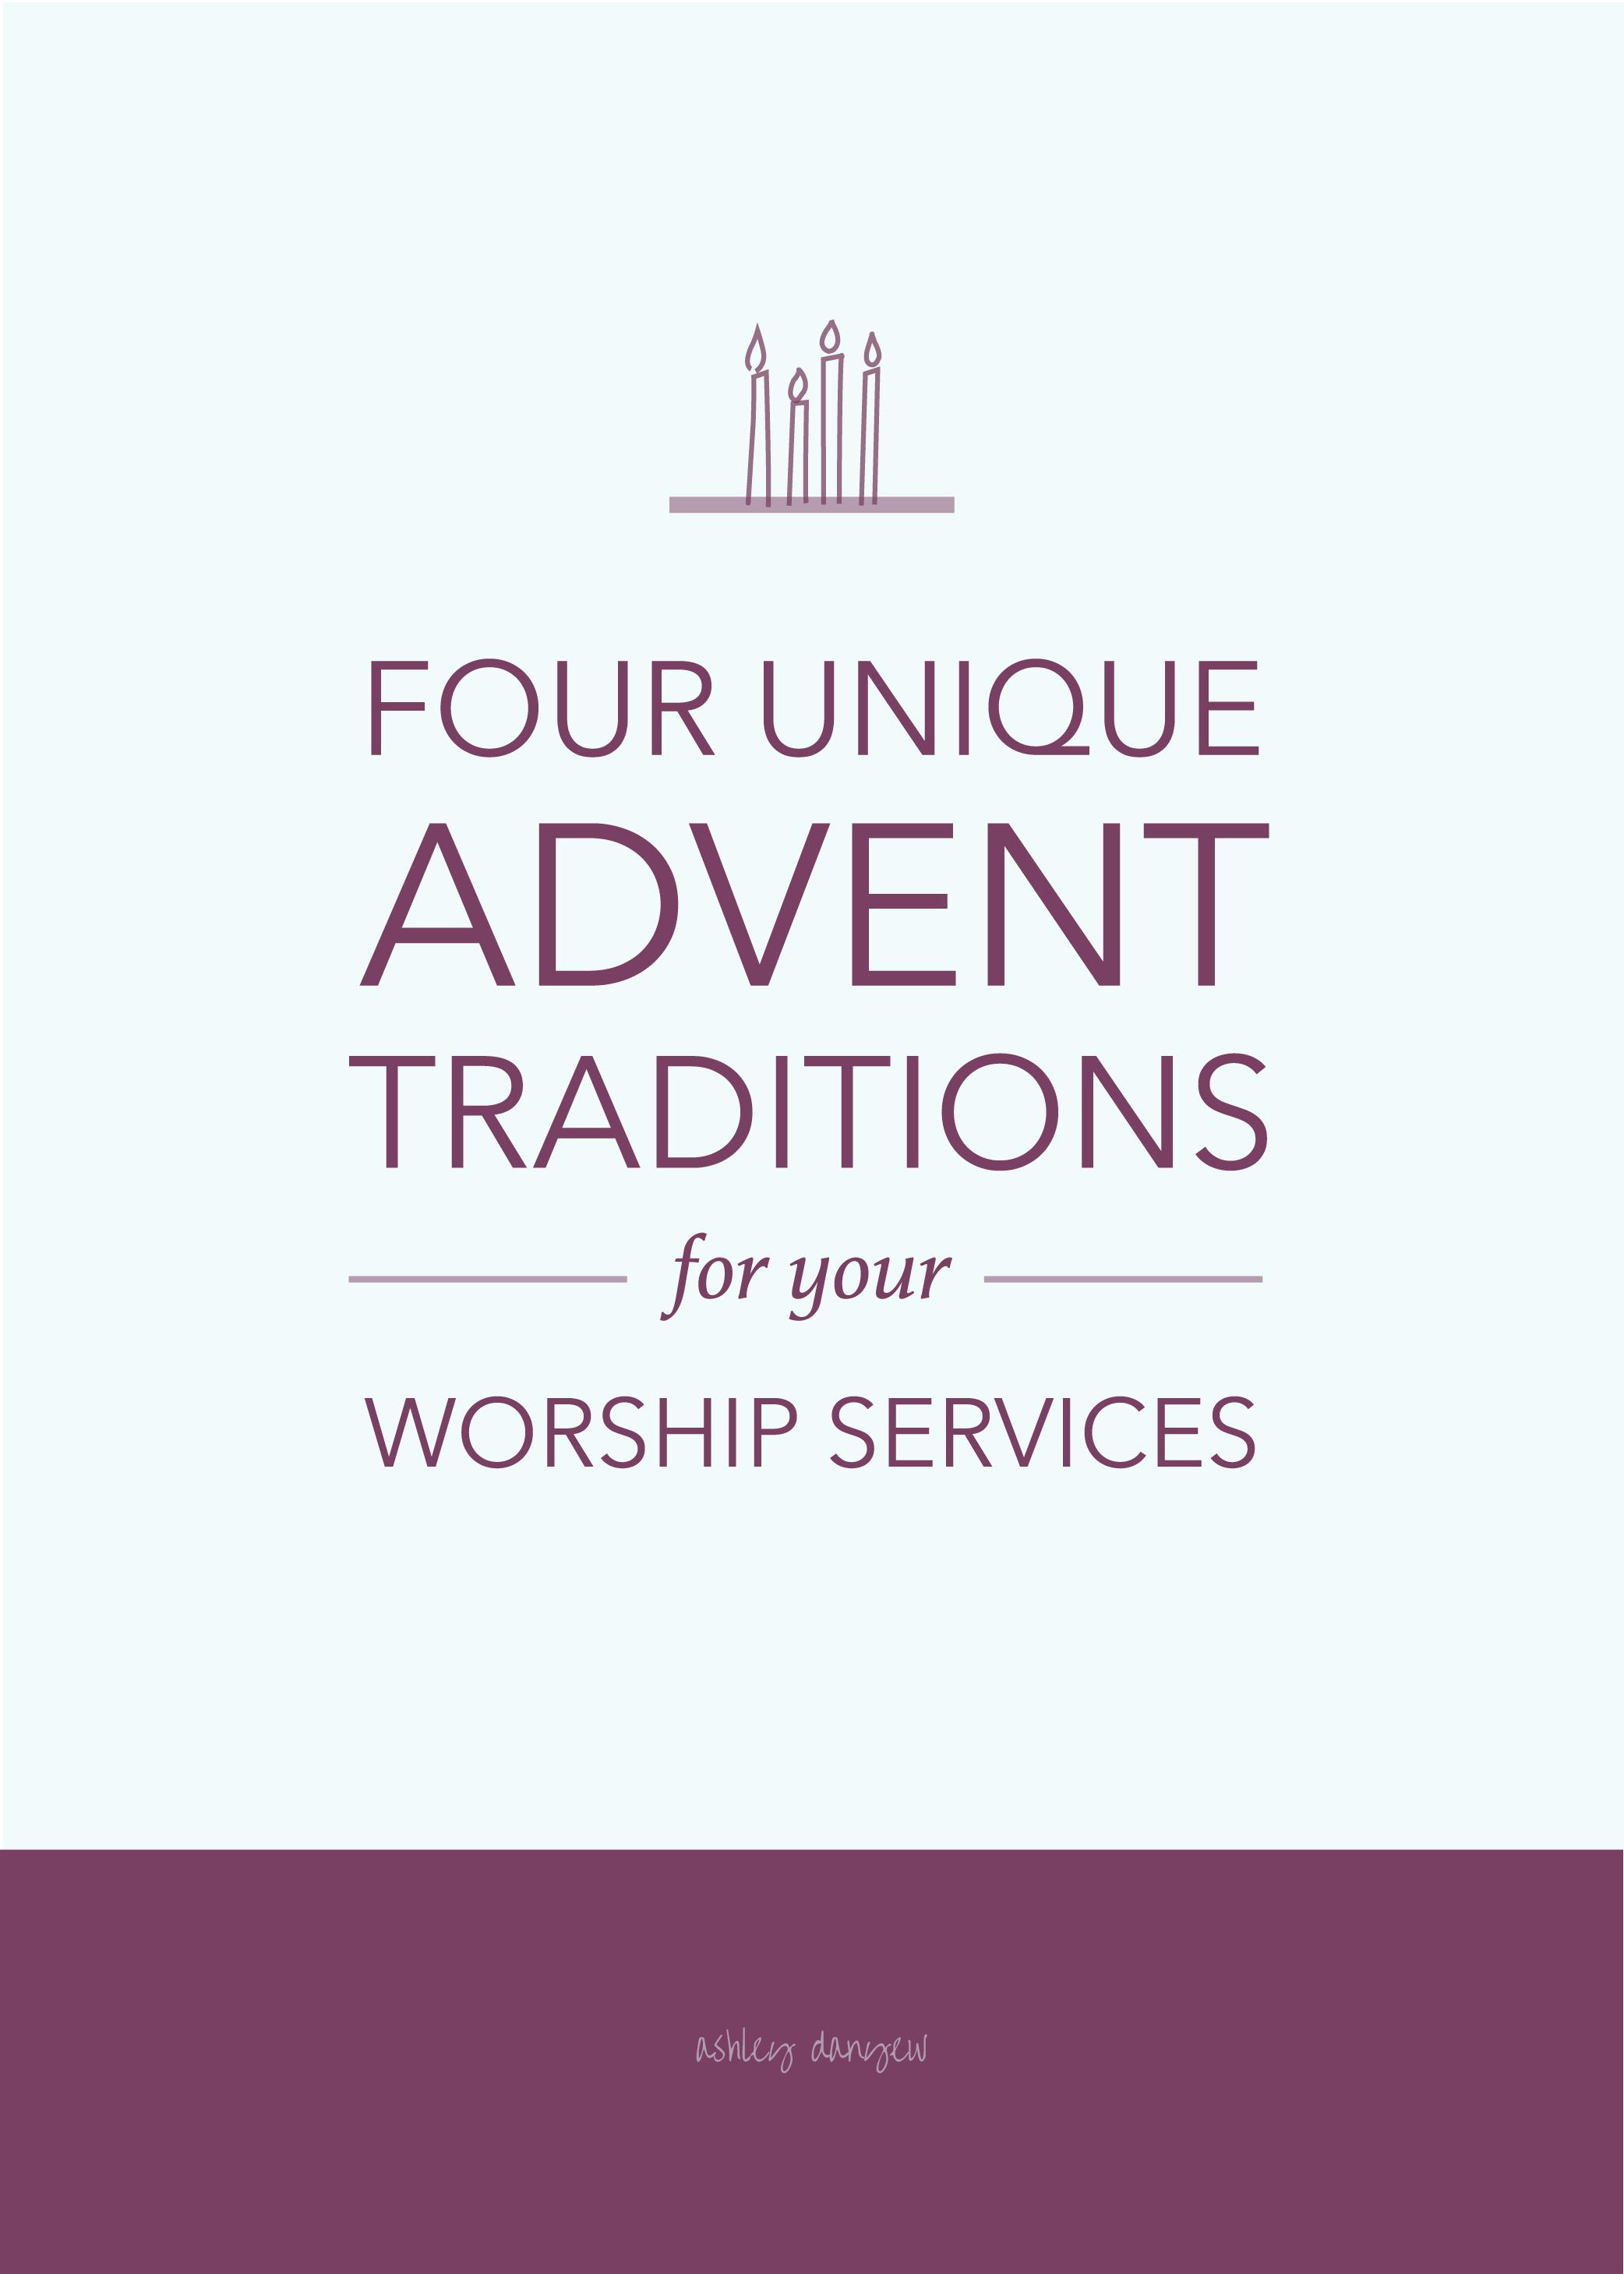 Advent Worship 2017 – Grace Lutheran Church Denison TX |Worship Service Advent Ideas